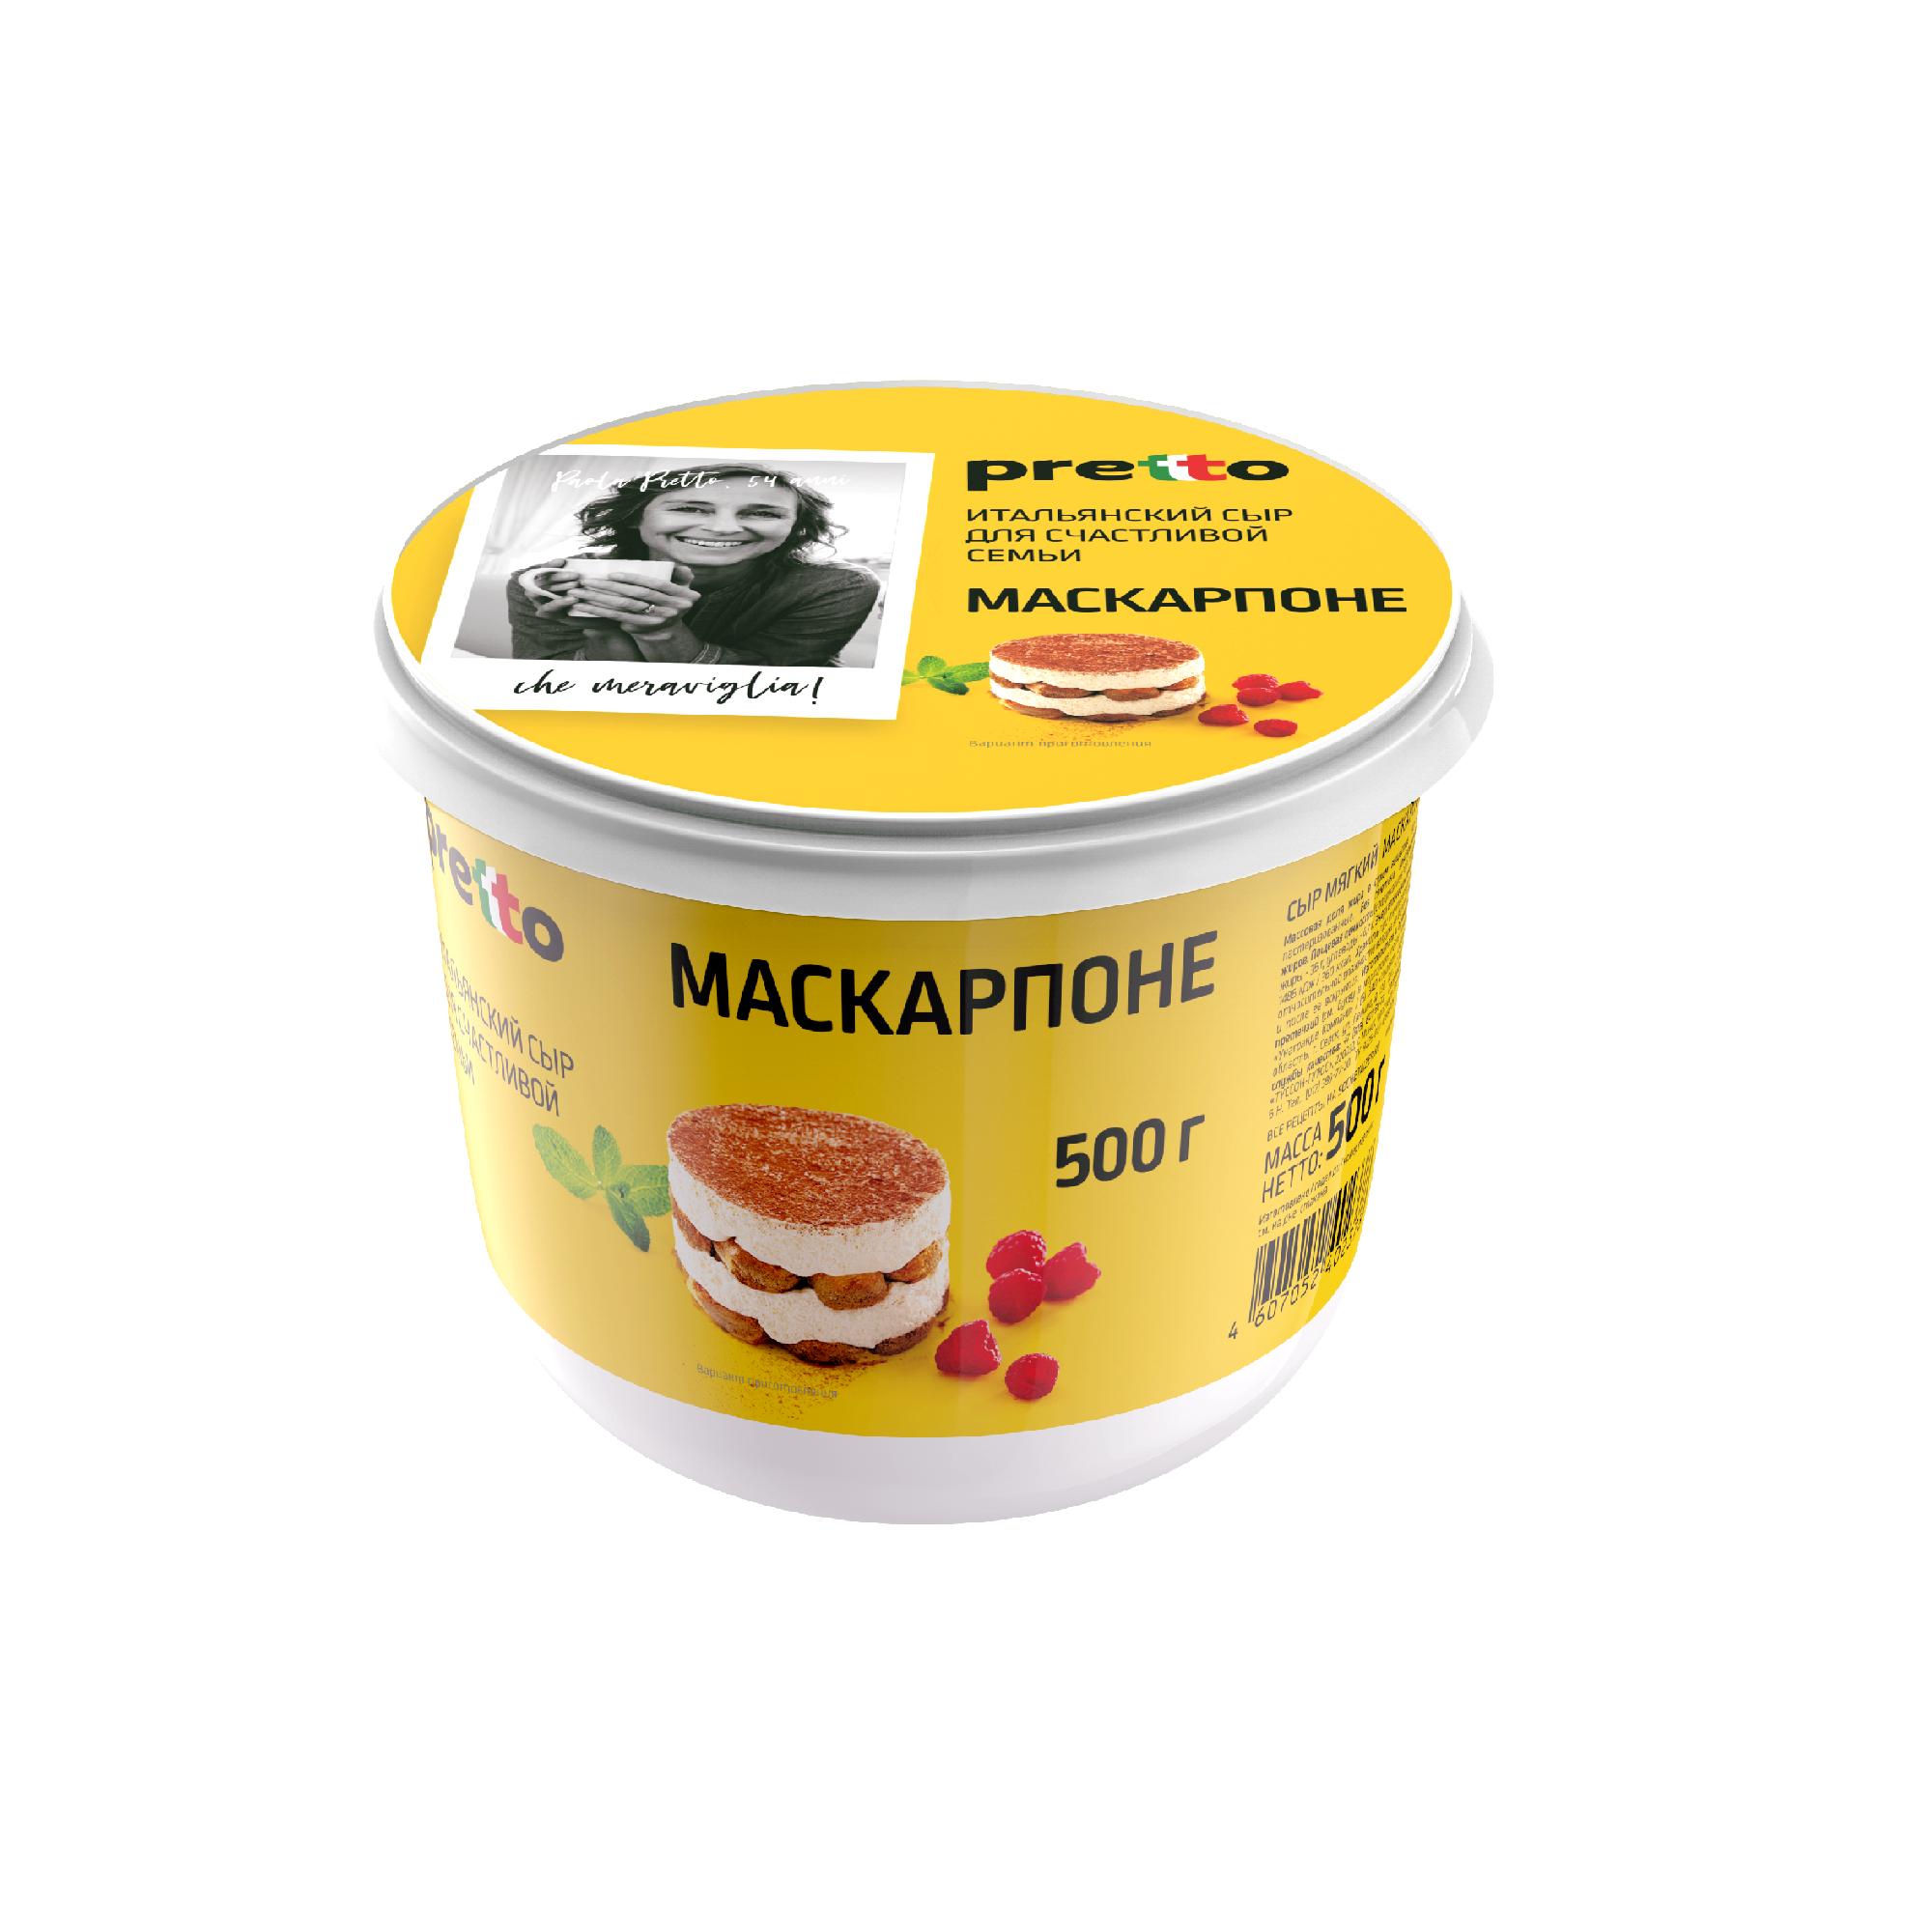 Сыр Pretto Маскарпоне 80% 500 г недорого